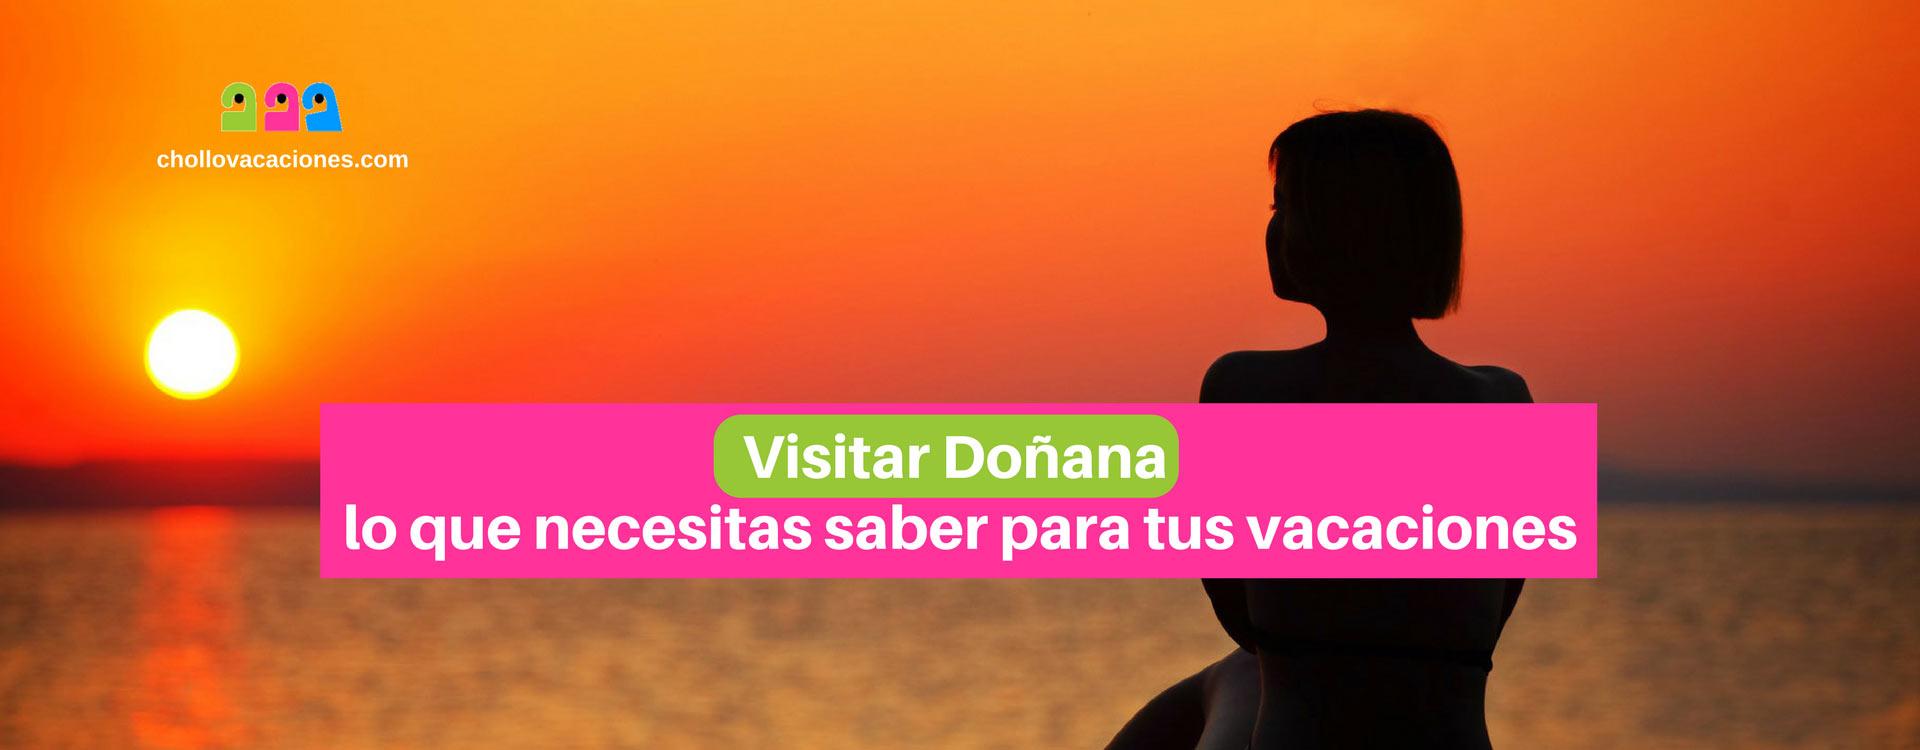 visitar Doñana